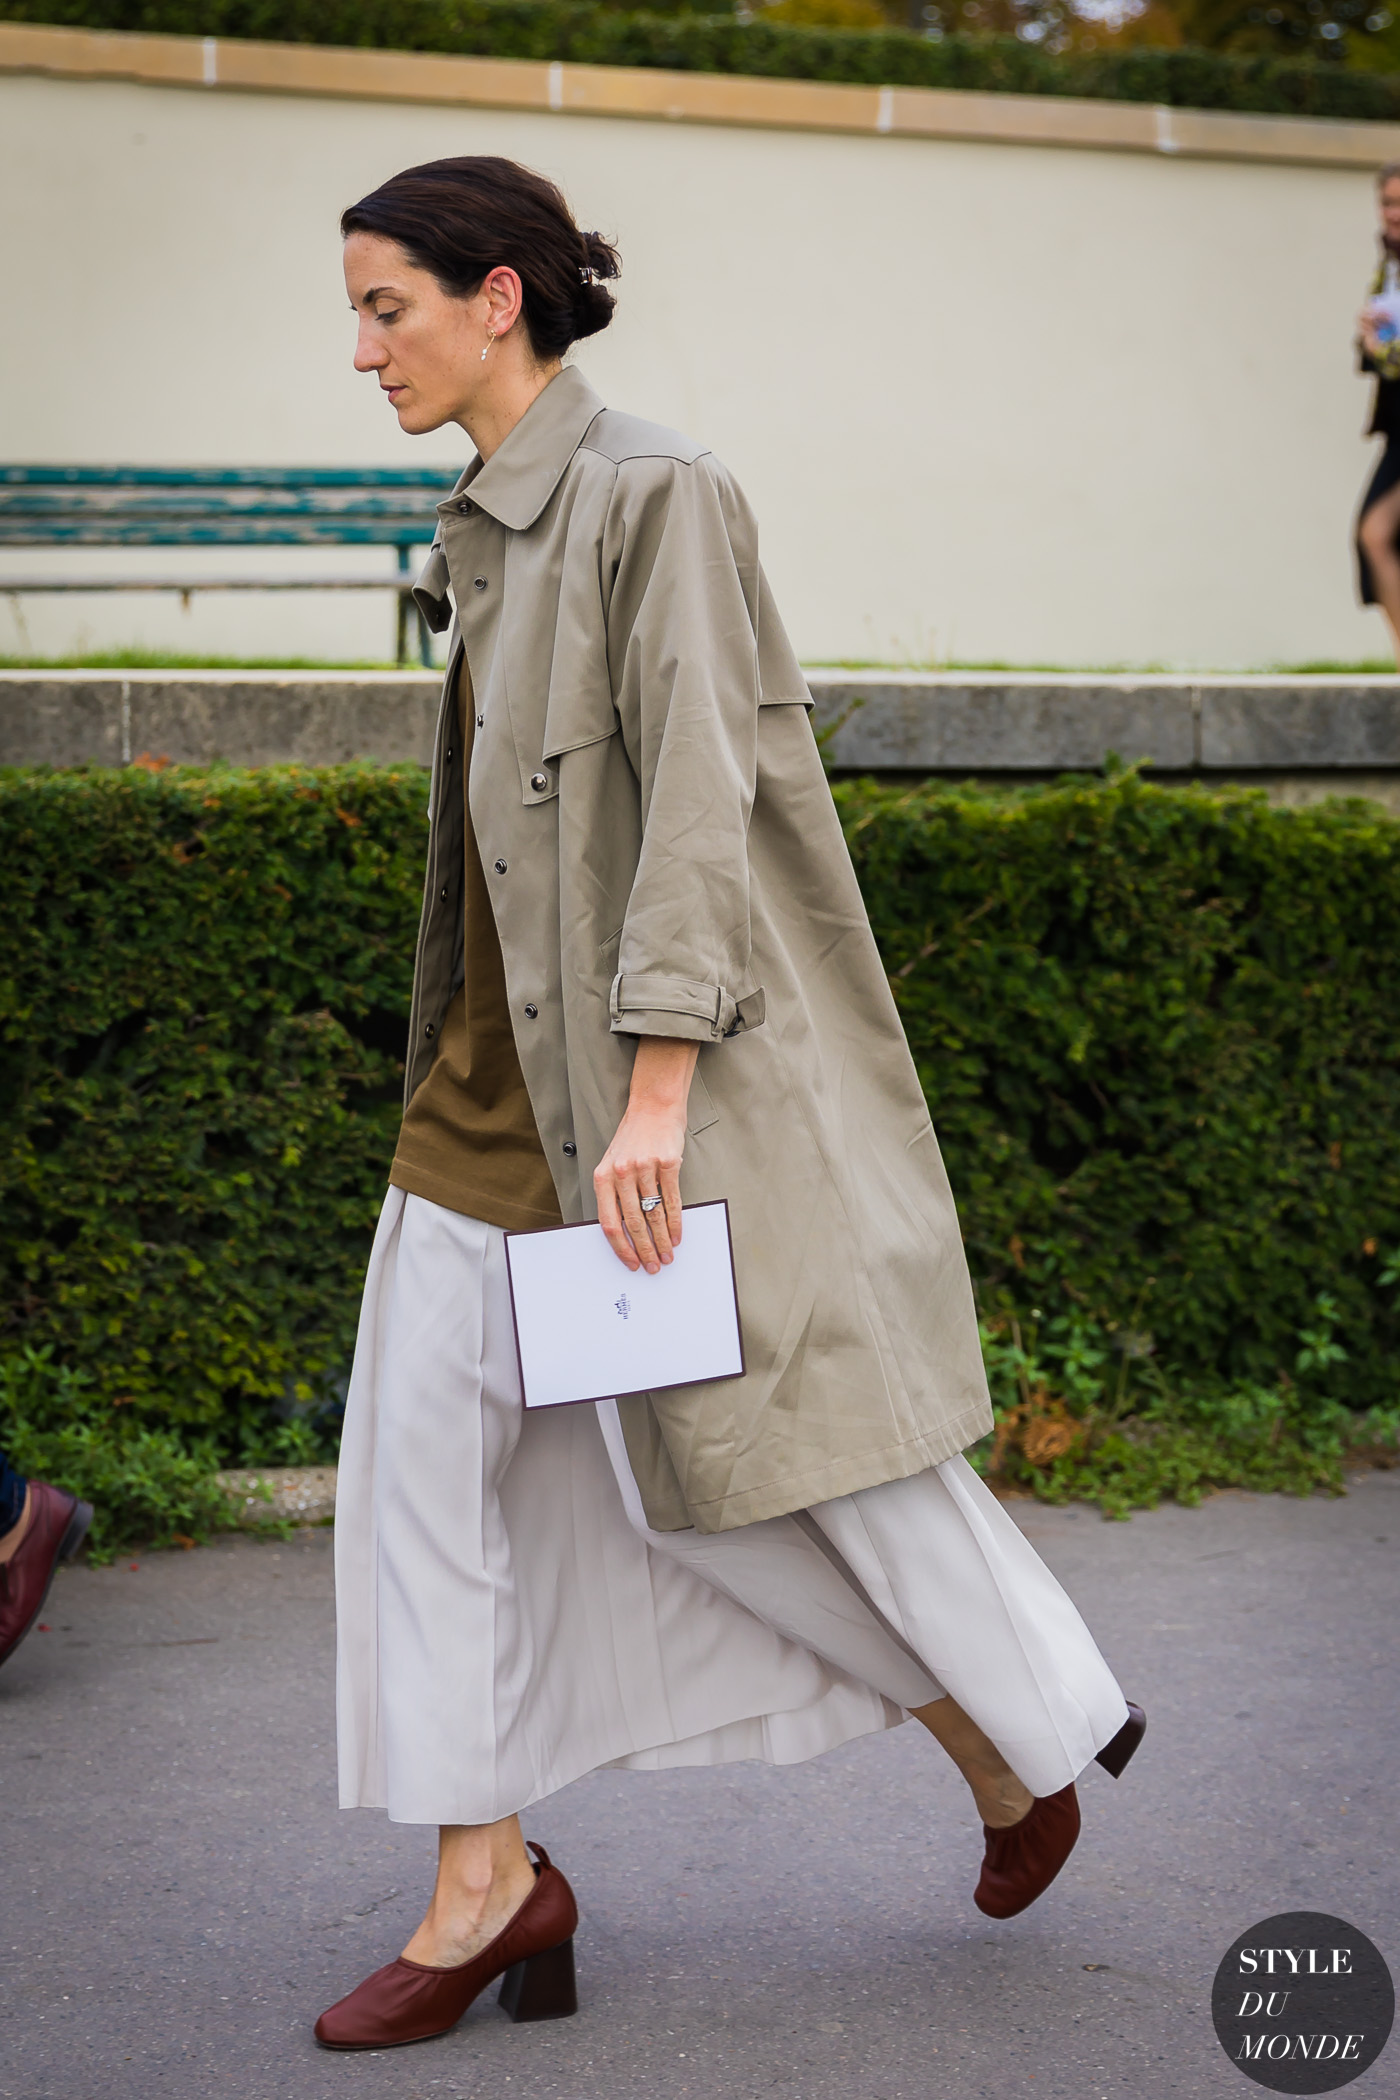 Melissa Ventosa Martin by STYLEDUMONDE Street Style Fashion Photography_48A1359